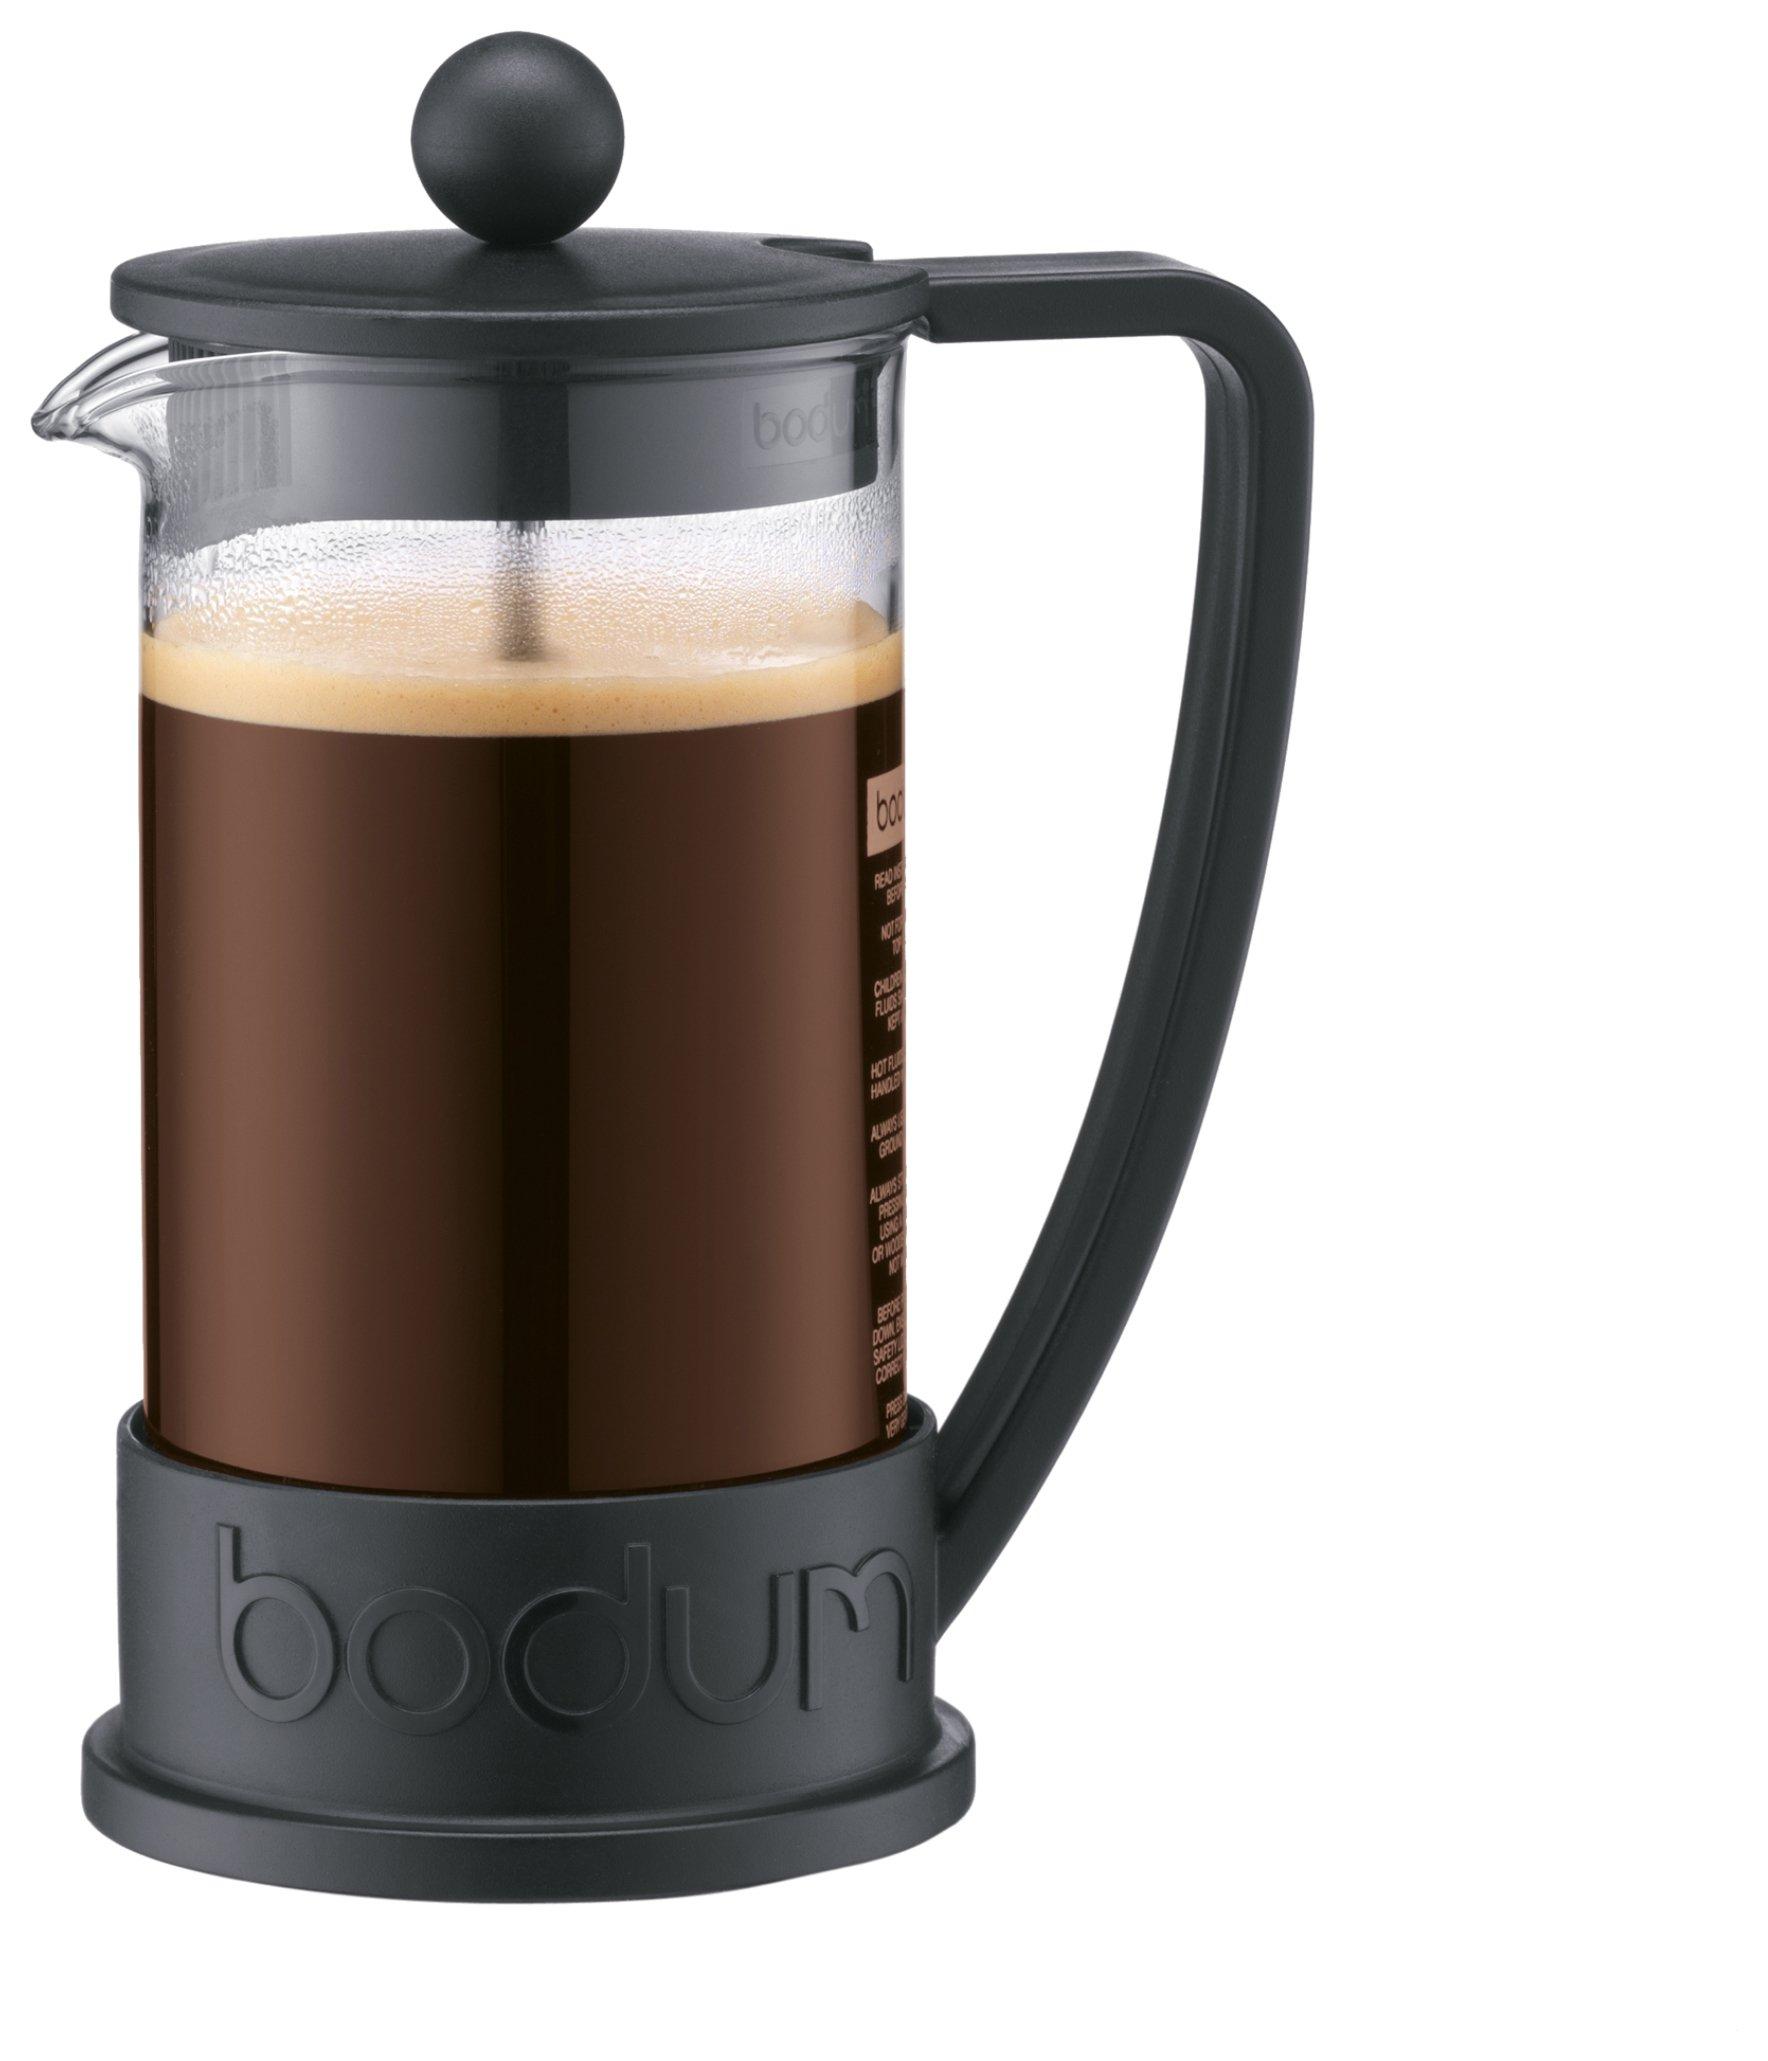 727015999685 upc bodum coffee press brazil 3 cup black upc lookup. Black Bedroom Furniture Sets. Home Design Ideas